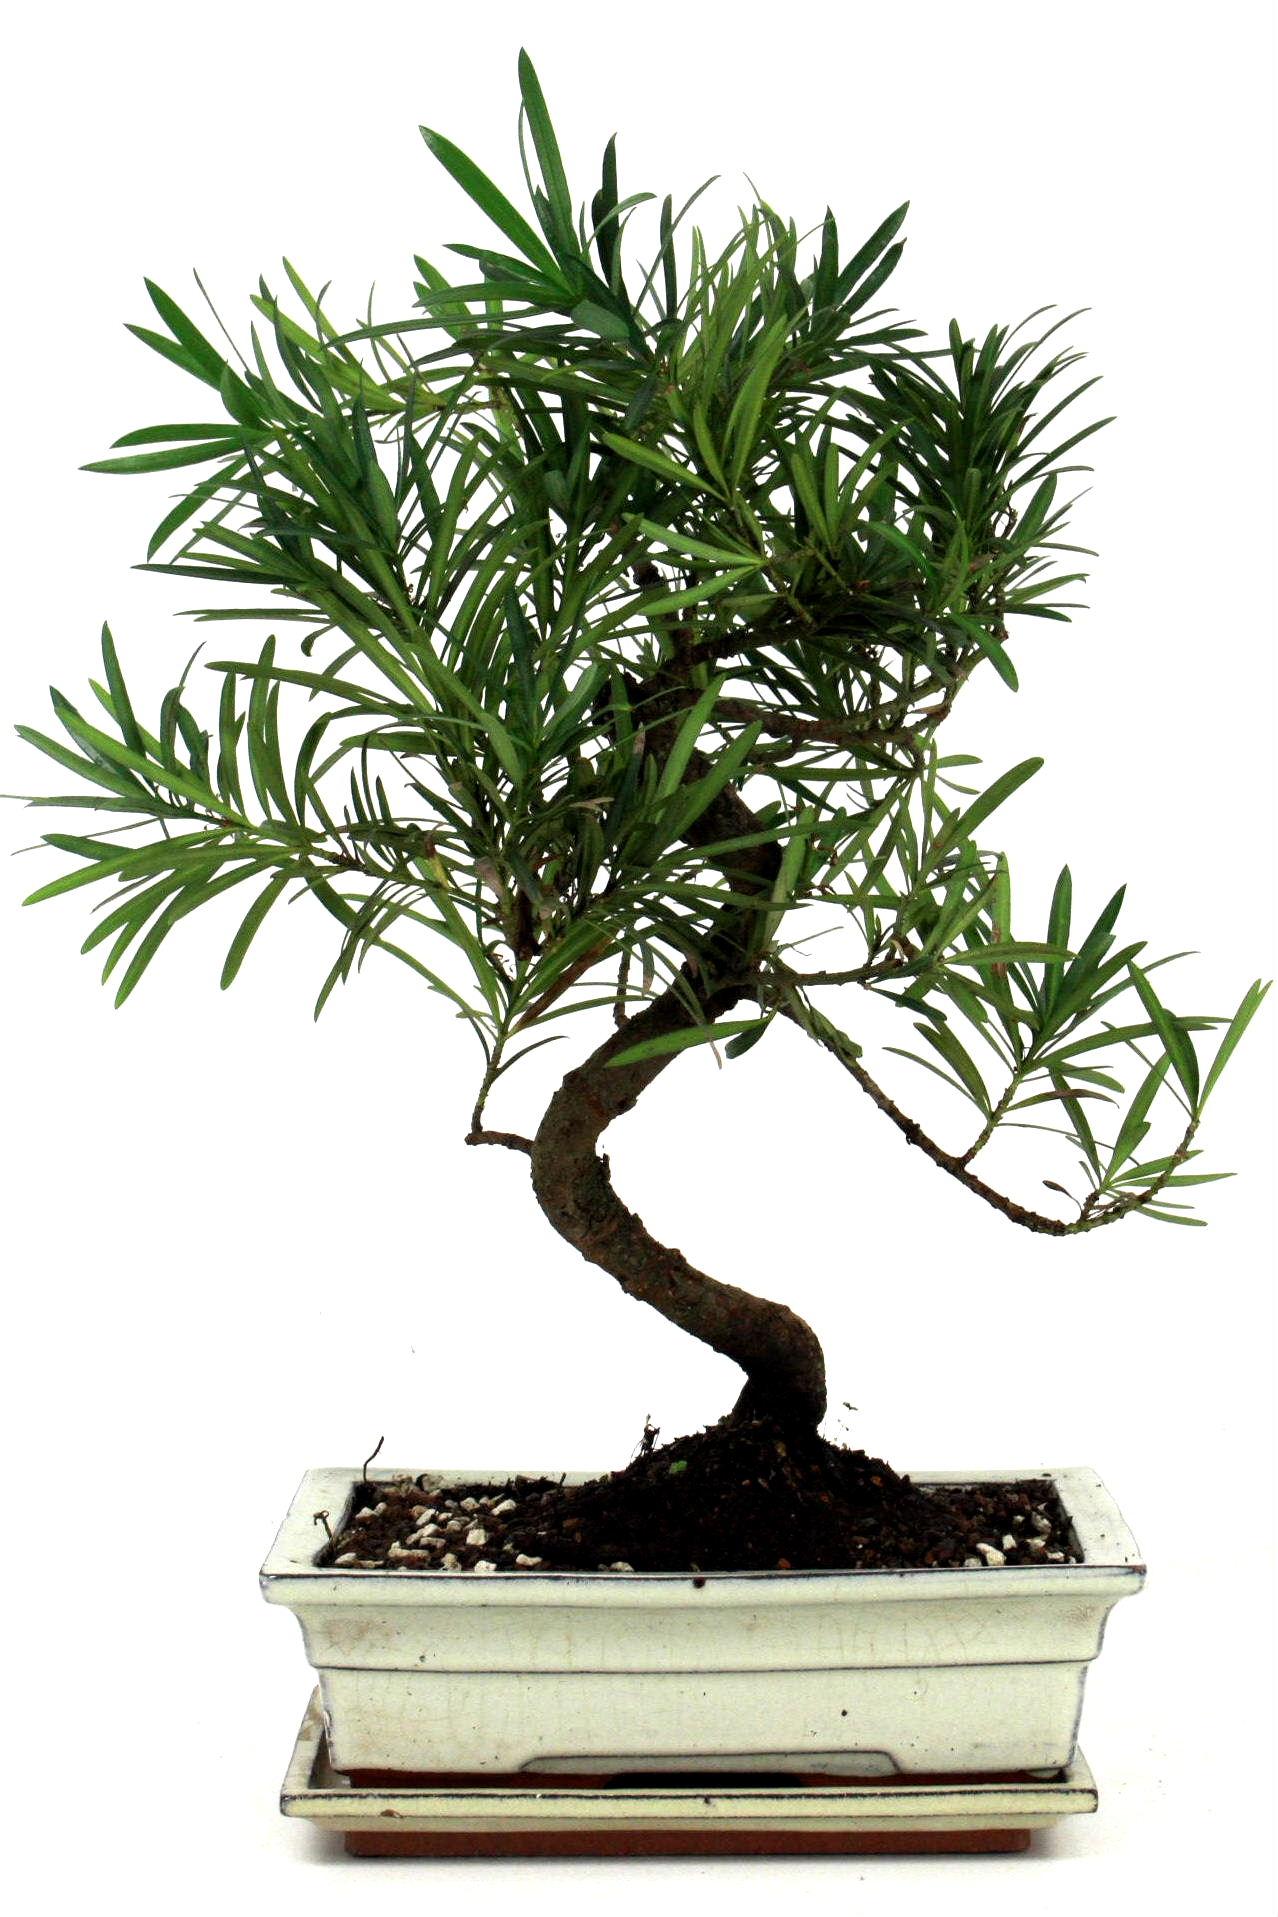 steineibe bonsai 45 50 cm w243 bei oyaki bonsai kaufen. Black Bedroom Furniture Sets. Home Design Ideas